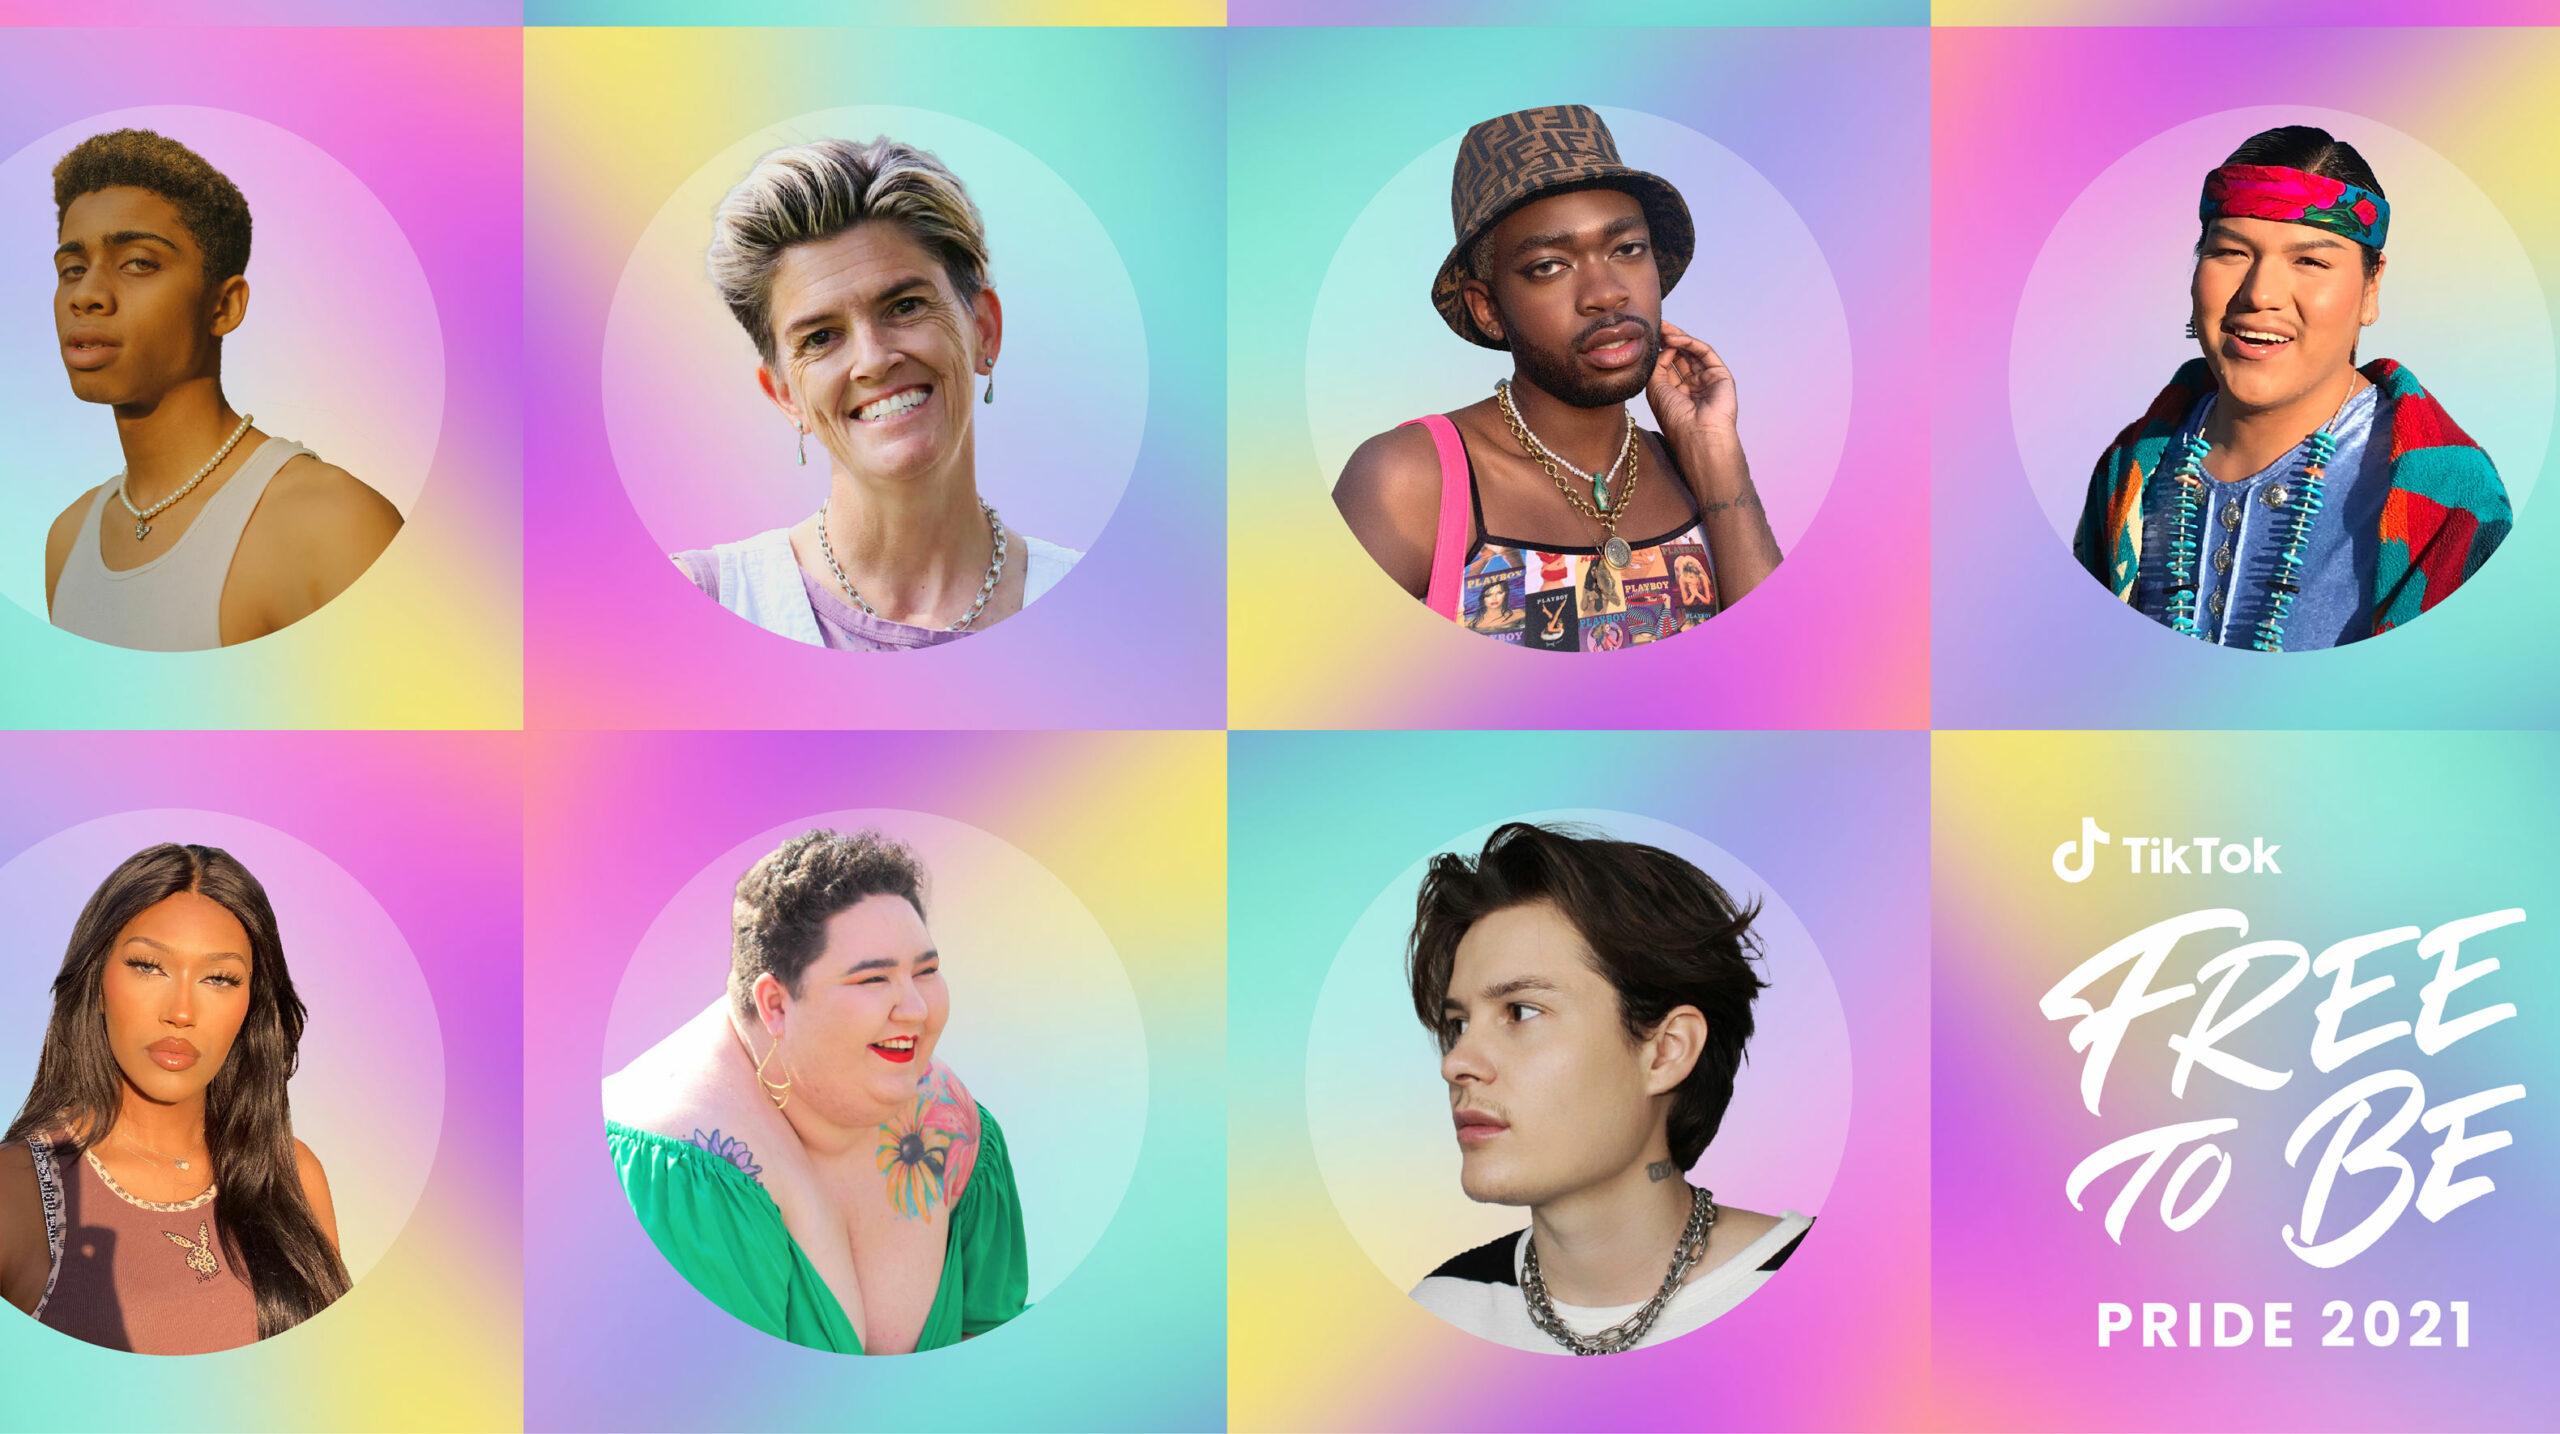 TikTok celebrates Pride Month with Canada's LGBTQ+ creators